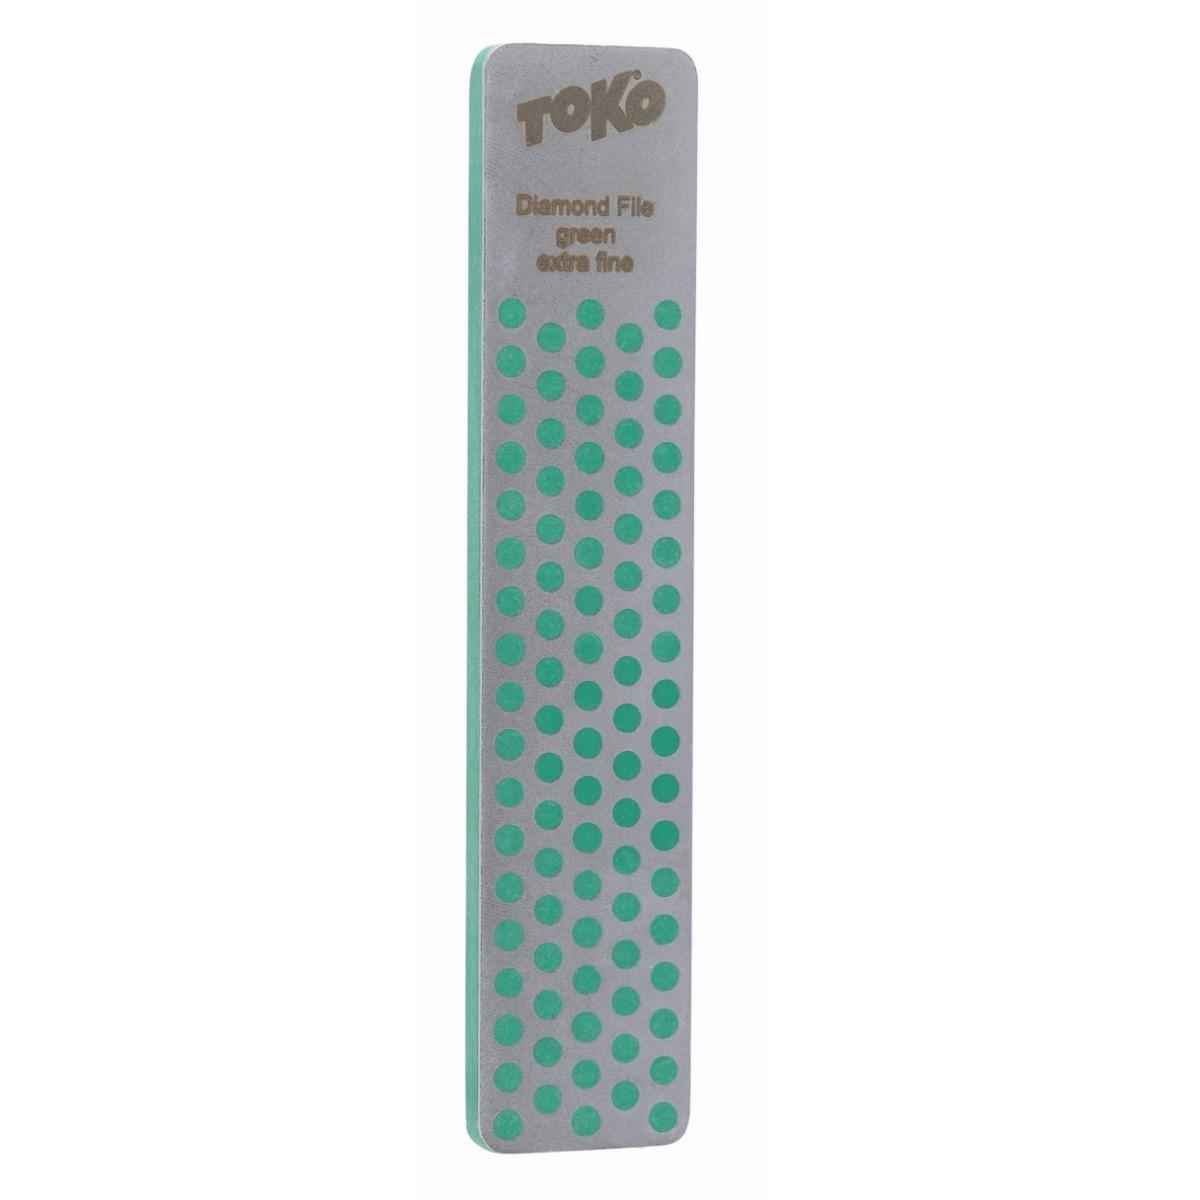 TOKO DMT DIAMOND FILE GREEN (Toko)TOKO DMT DIAMOND FILE GREEN (Toko)